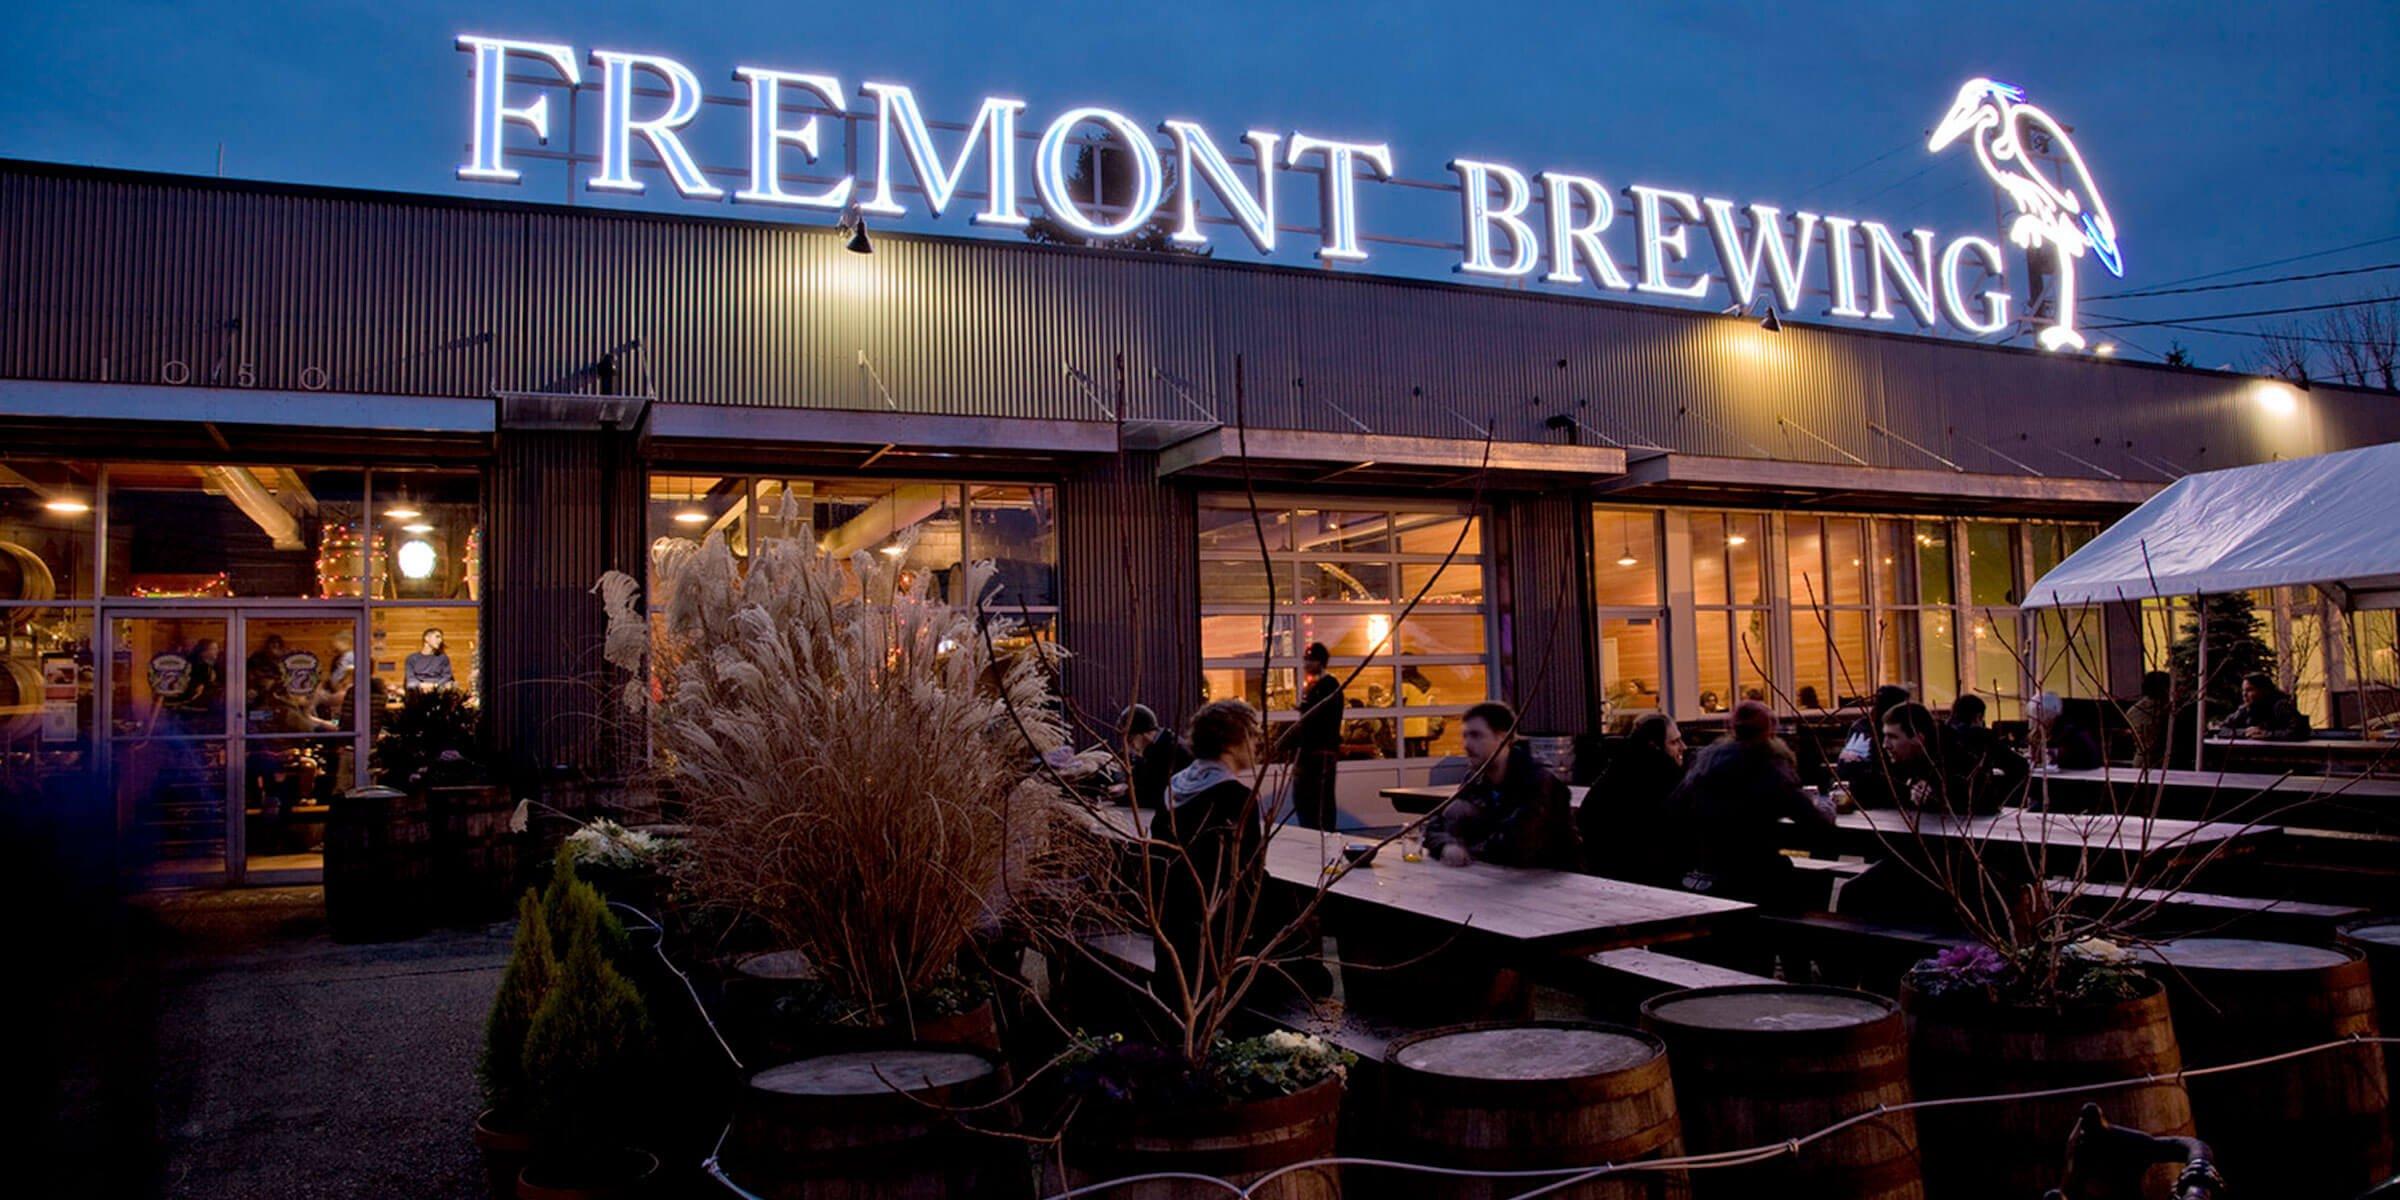 Outside Fremont Brewing in Seattle, Washington